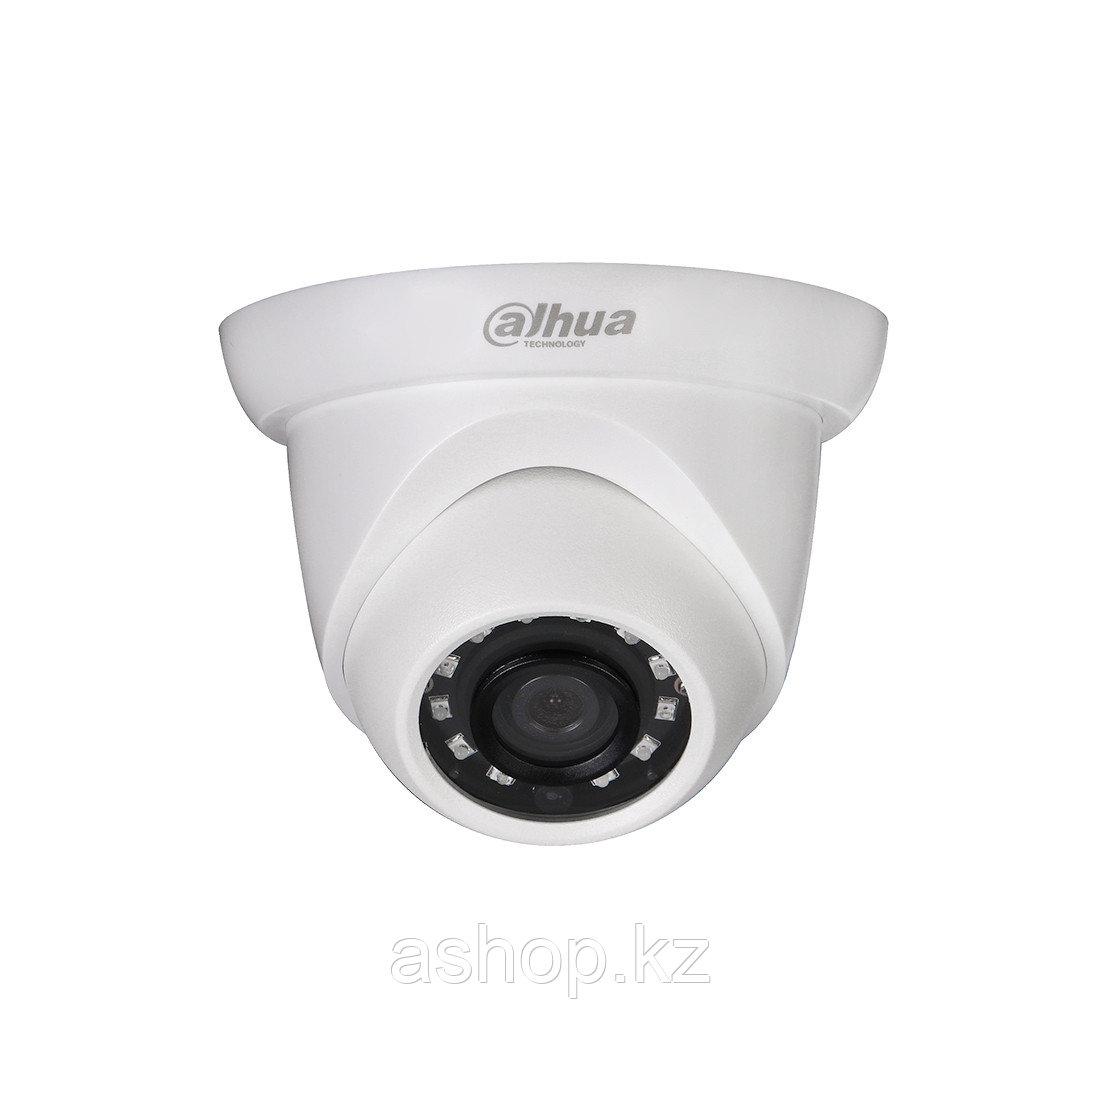 Камера IP купольная Dahua DH-IPC-HDW1220SP-0280B, Разрешение: 2 Mpi dpi, Тип объектива: f = 2,8 мм, ИК подсвет